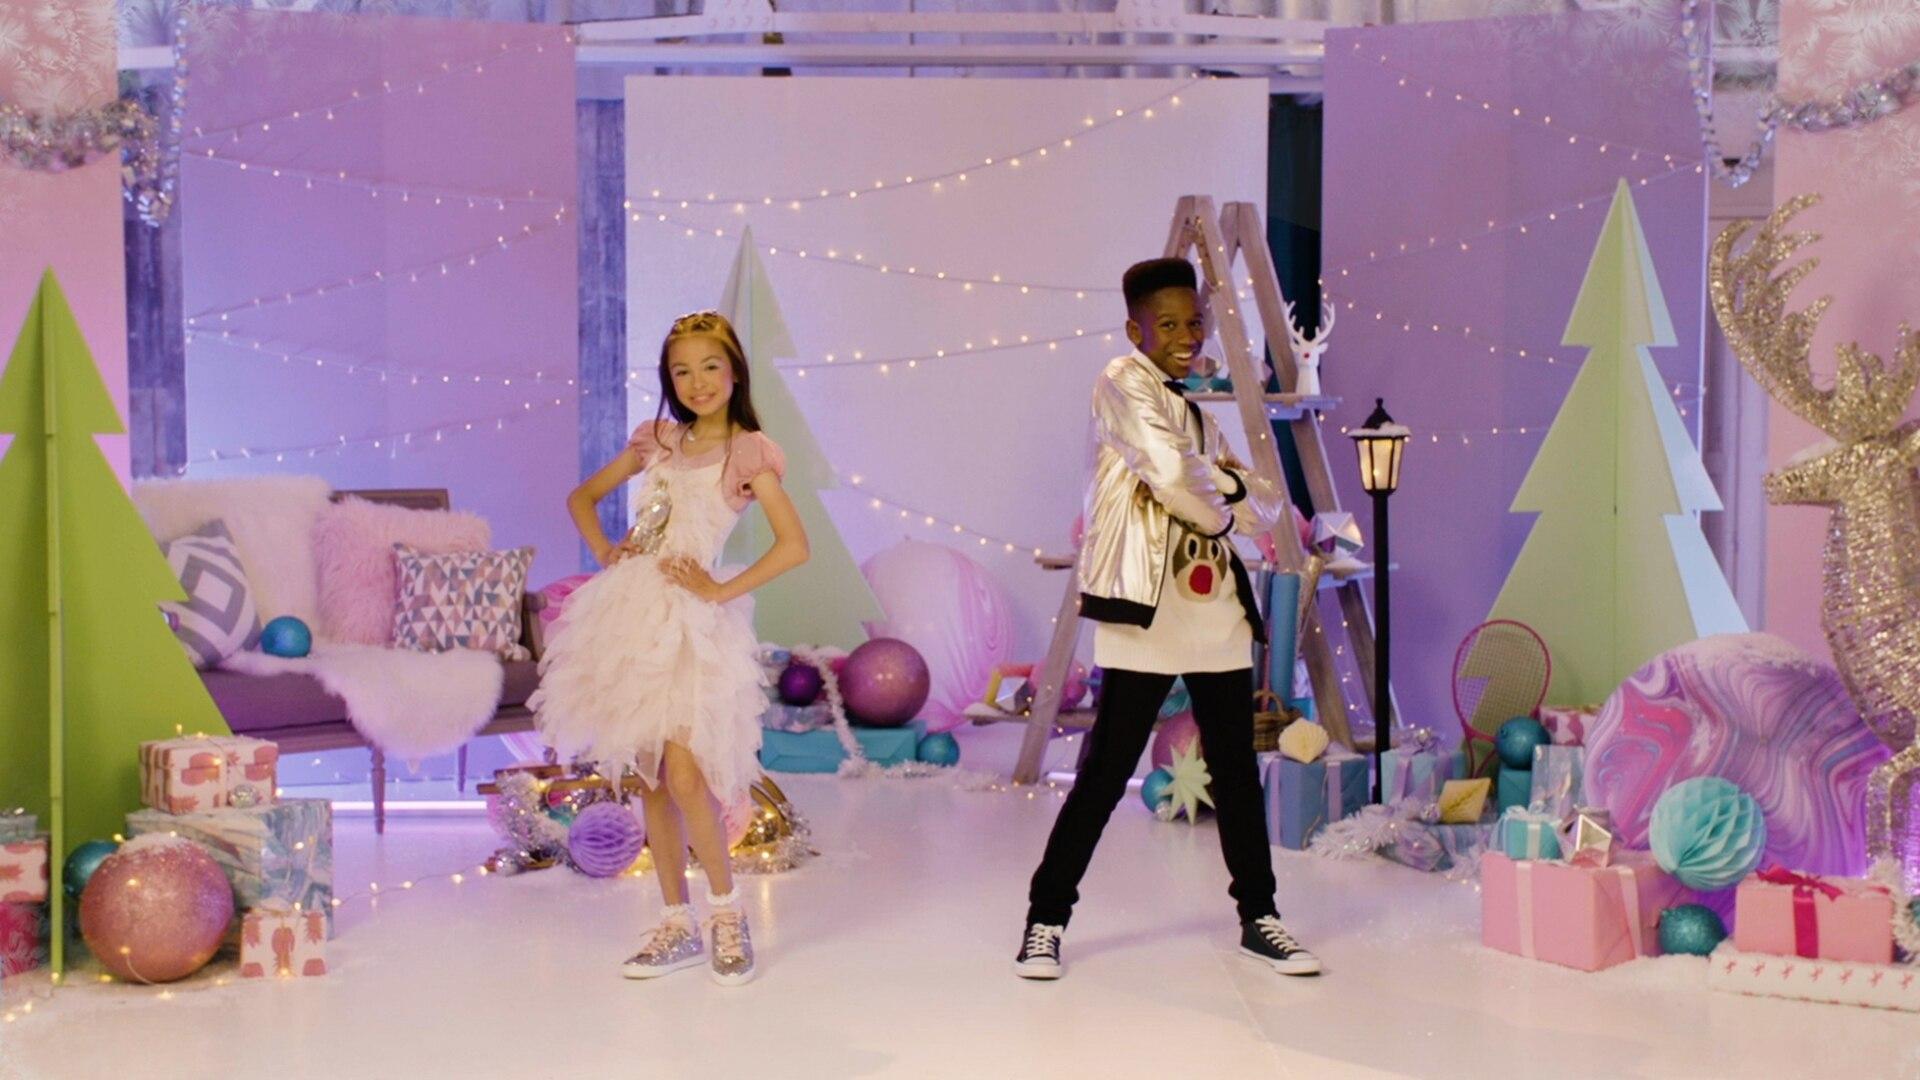 Kidz Bop Kids - Last Christmas Dance Alo